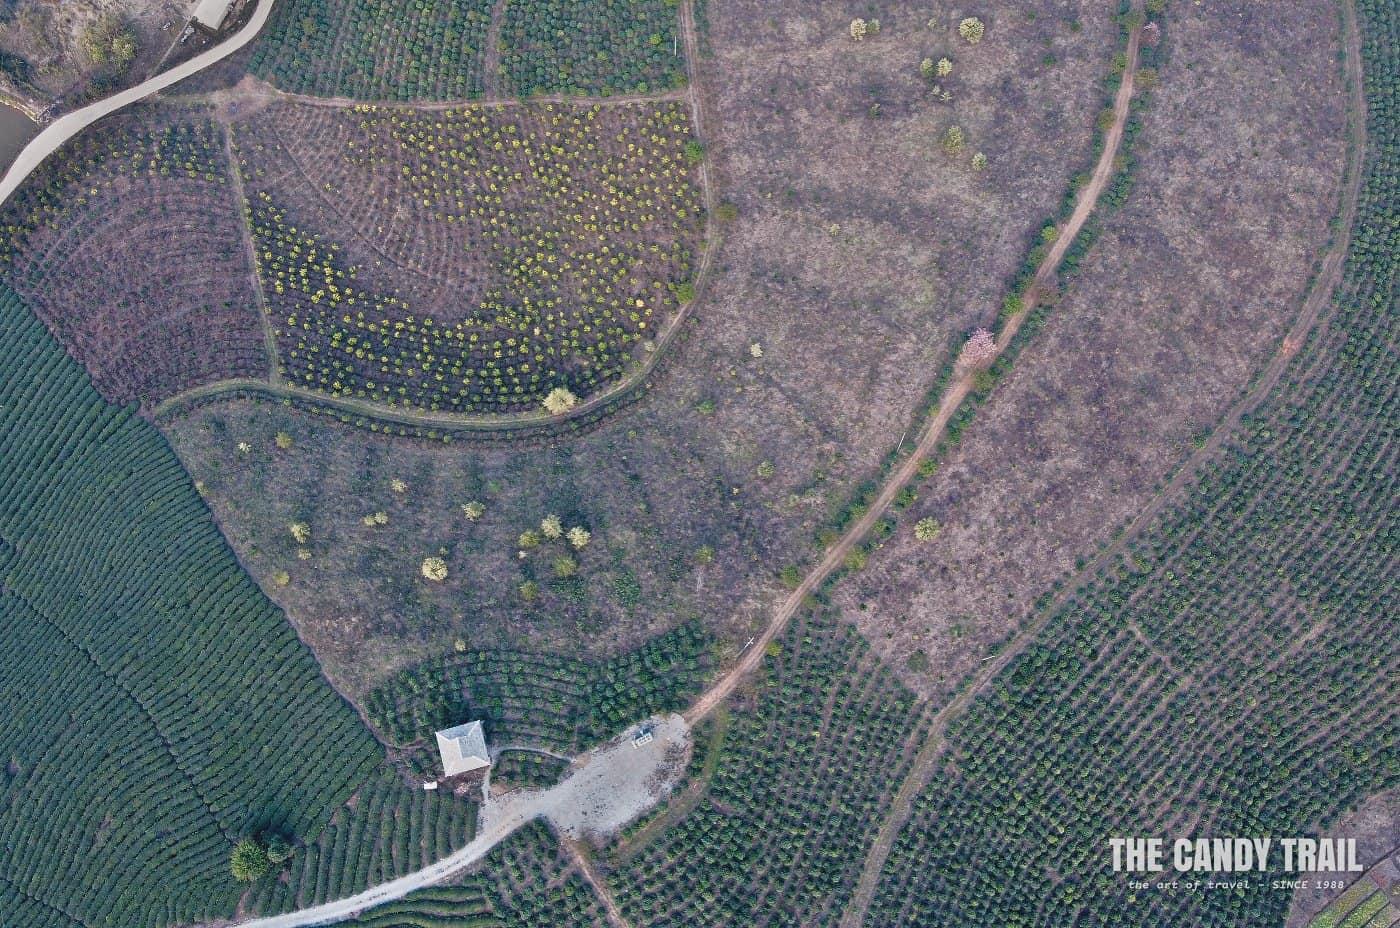 pu-erh tea plantations patterns of xishuangbanna in china